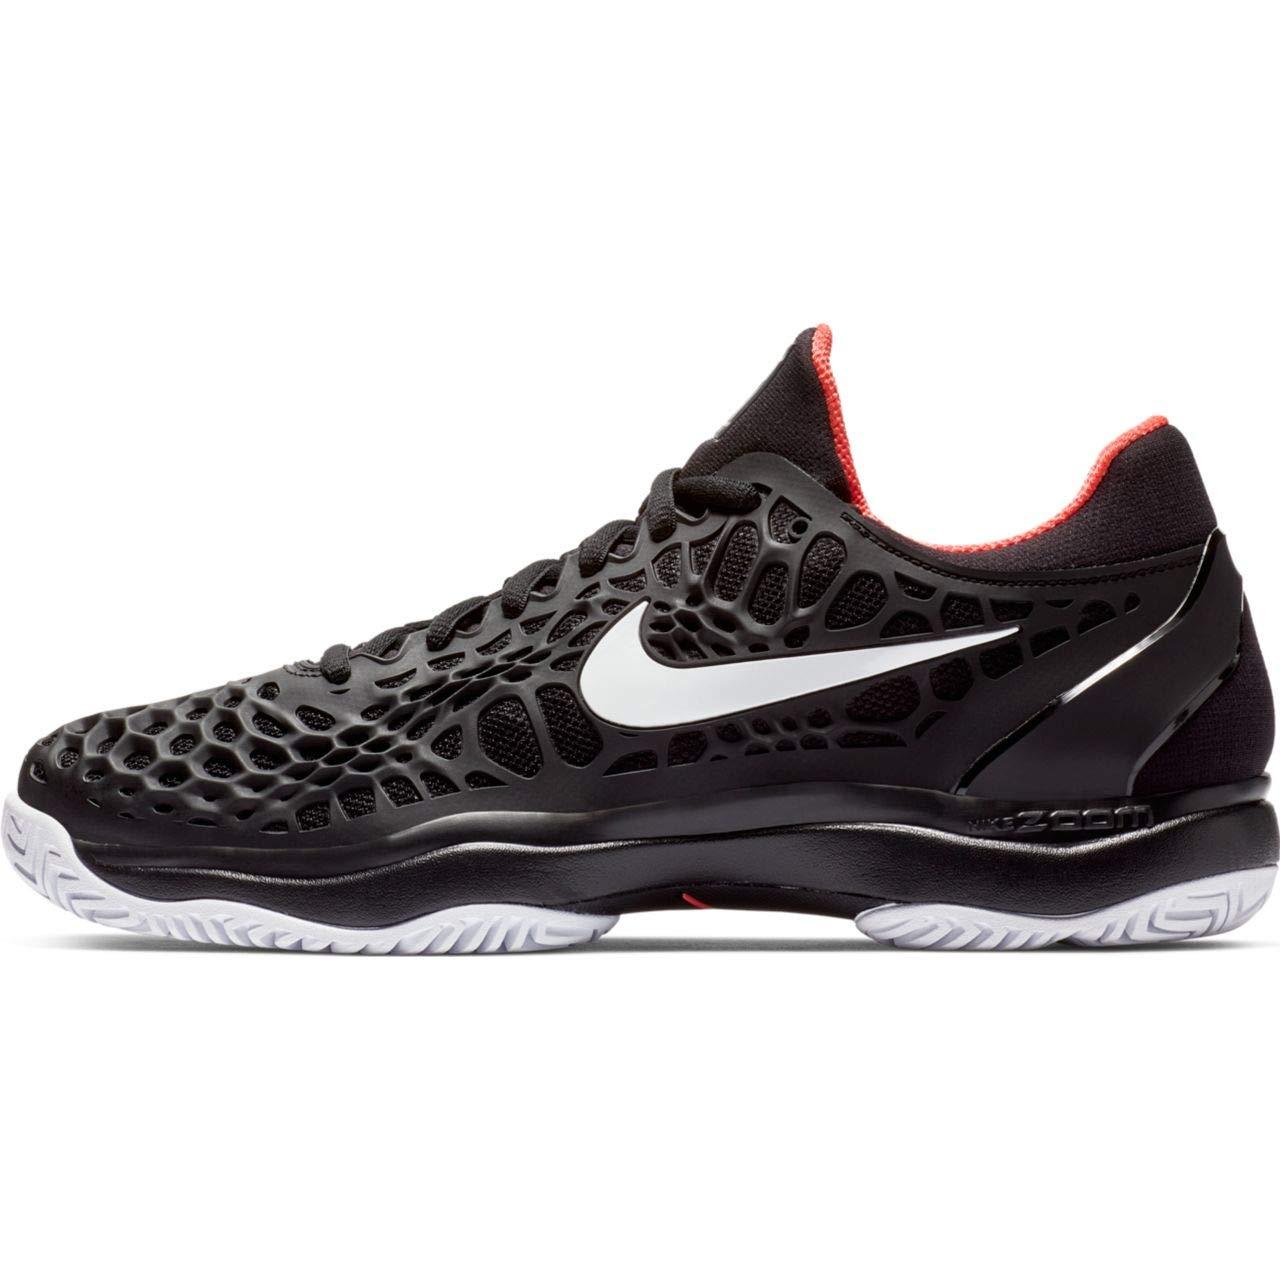 d8e014f7 Amazon.com | Nike Air Mission Mens Cross Training Shoes 629467-101 |  Fitness & Cross-Training